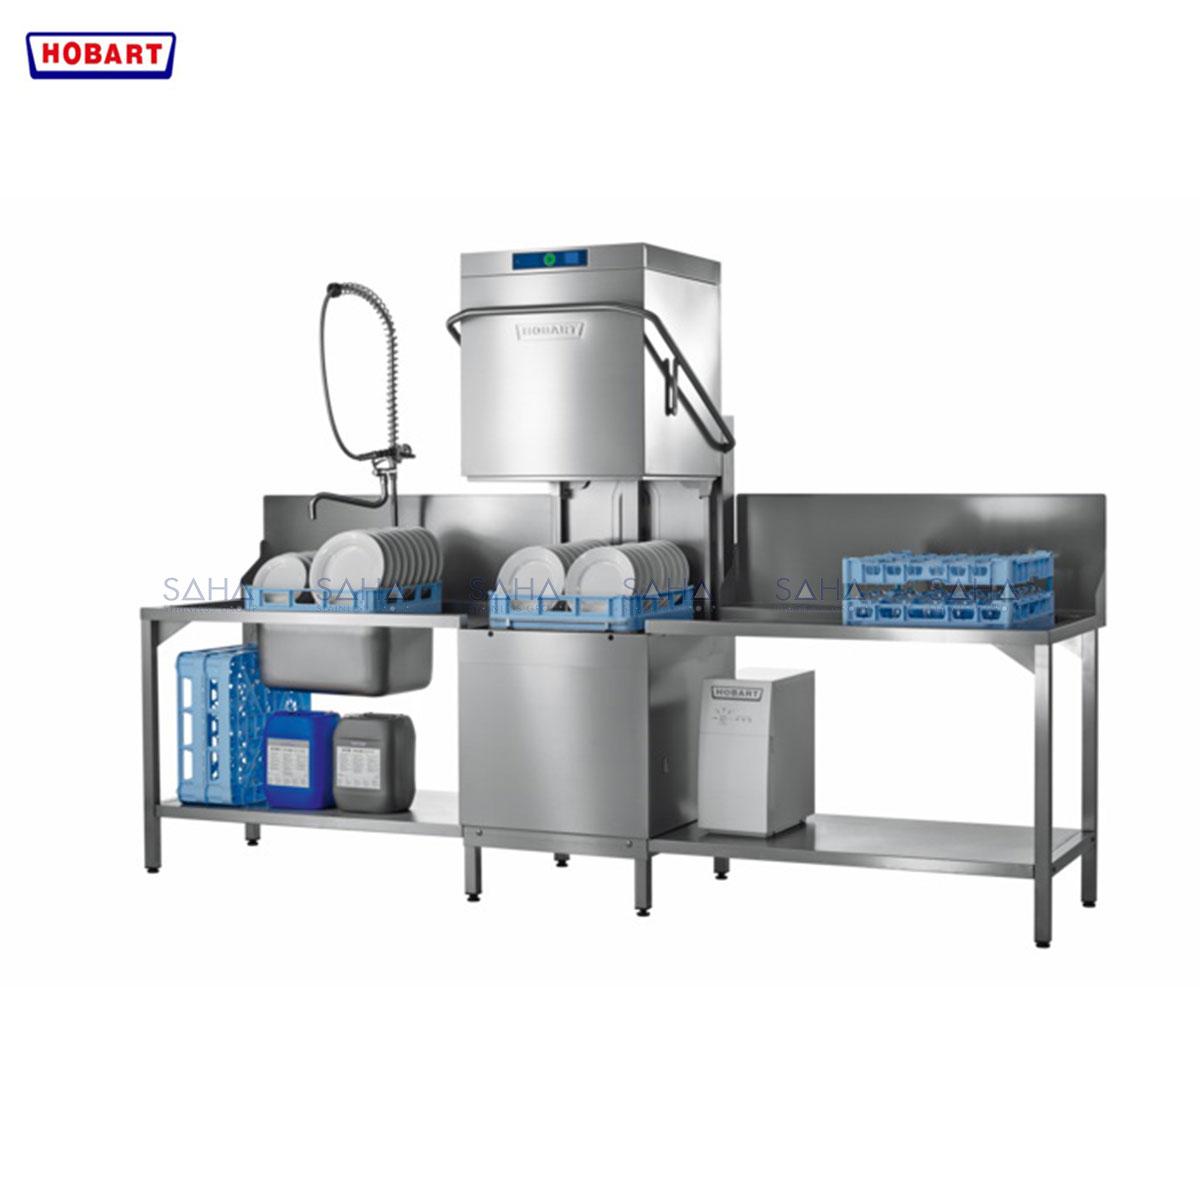 Hobart - Dishwasher - PROFI AMX